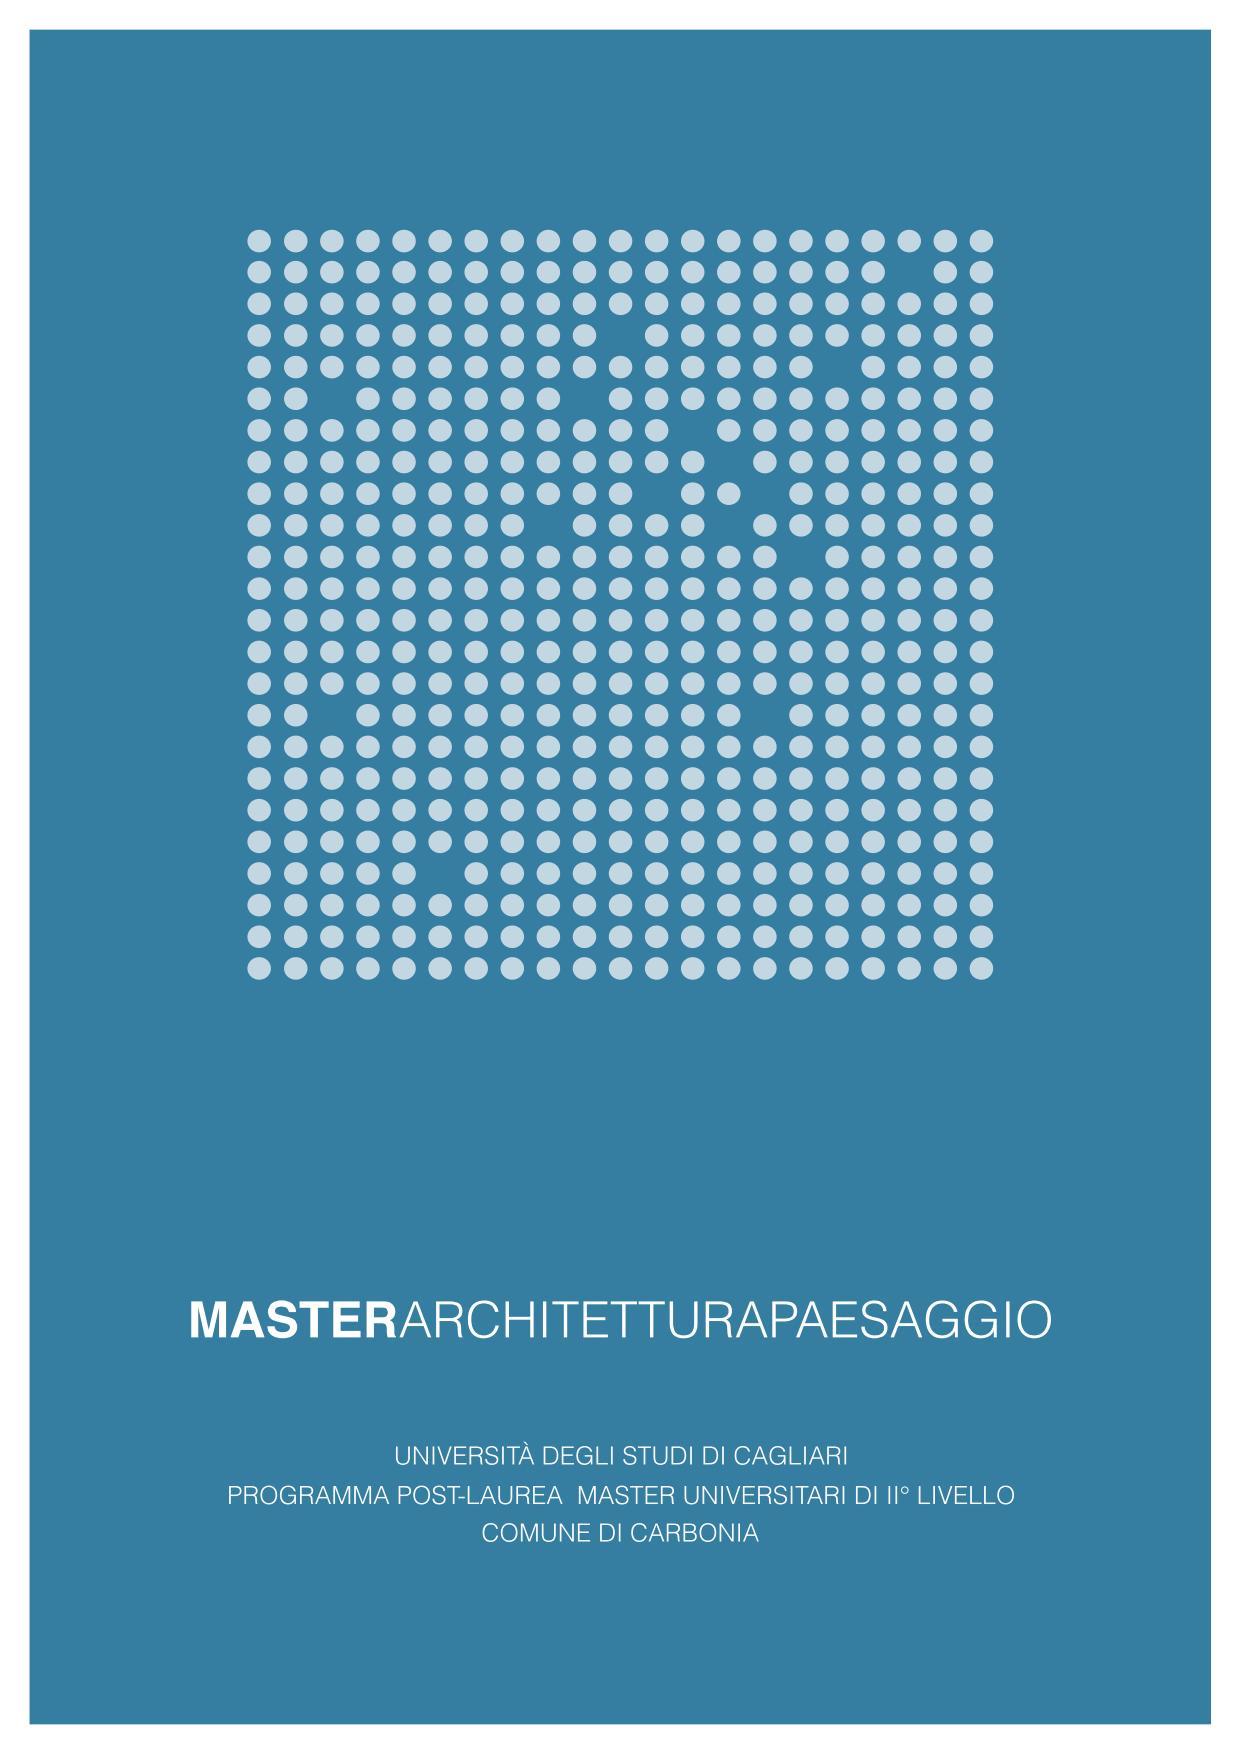 MASTER ARCHITETTURA PAESAGGIO